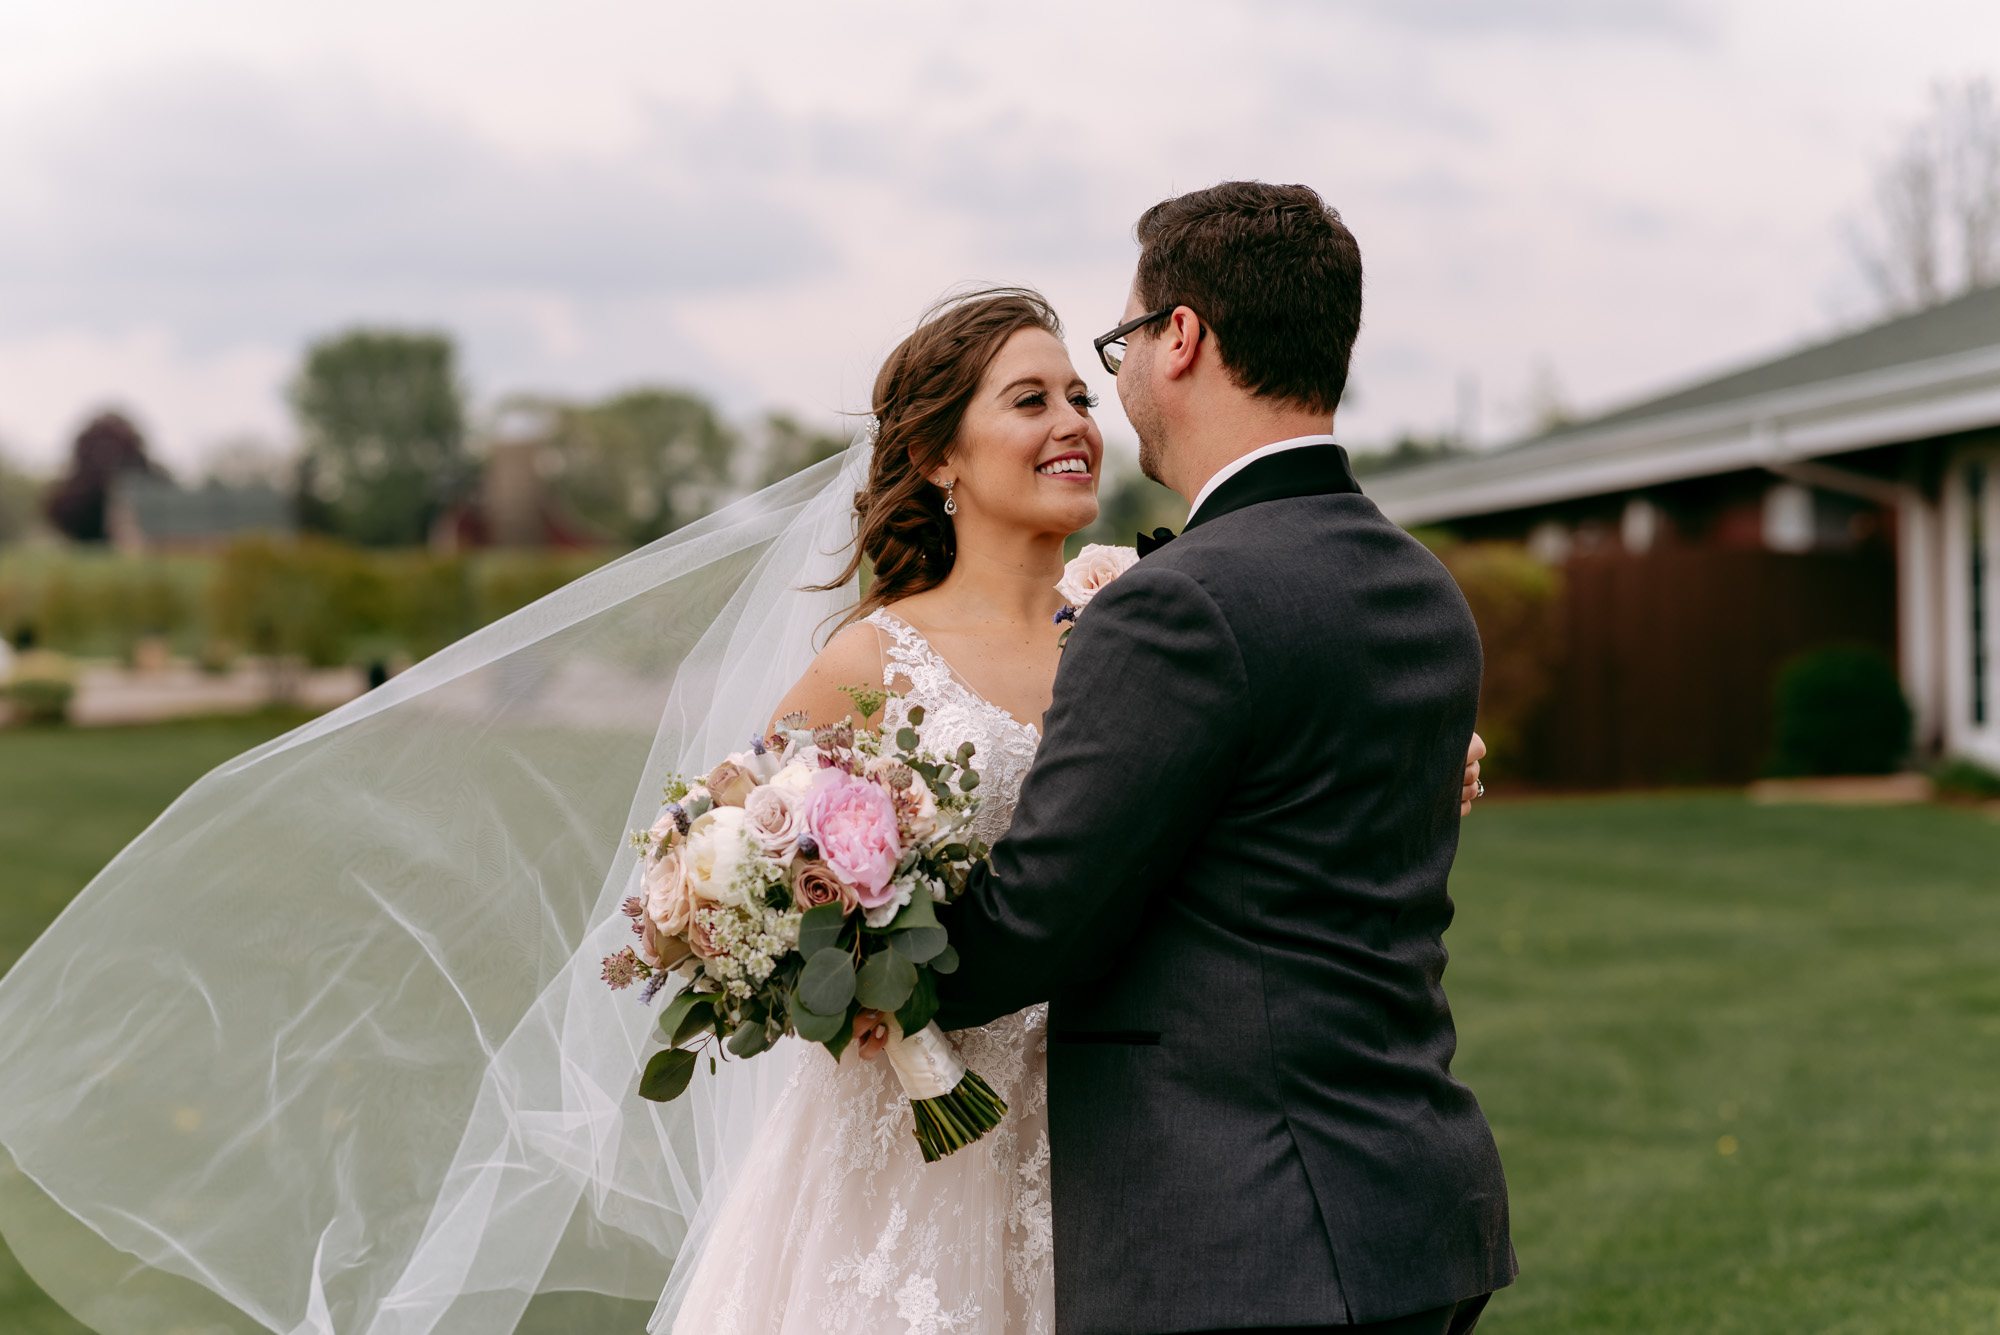 orchard-farms-pavillion-wedding-rockton-IL-wedding-photographers-174.jpg